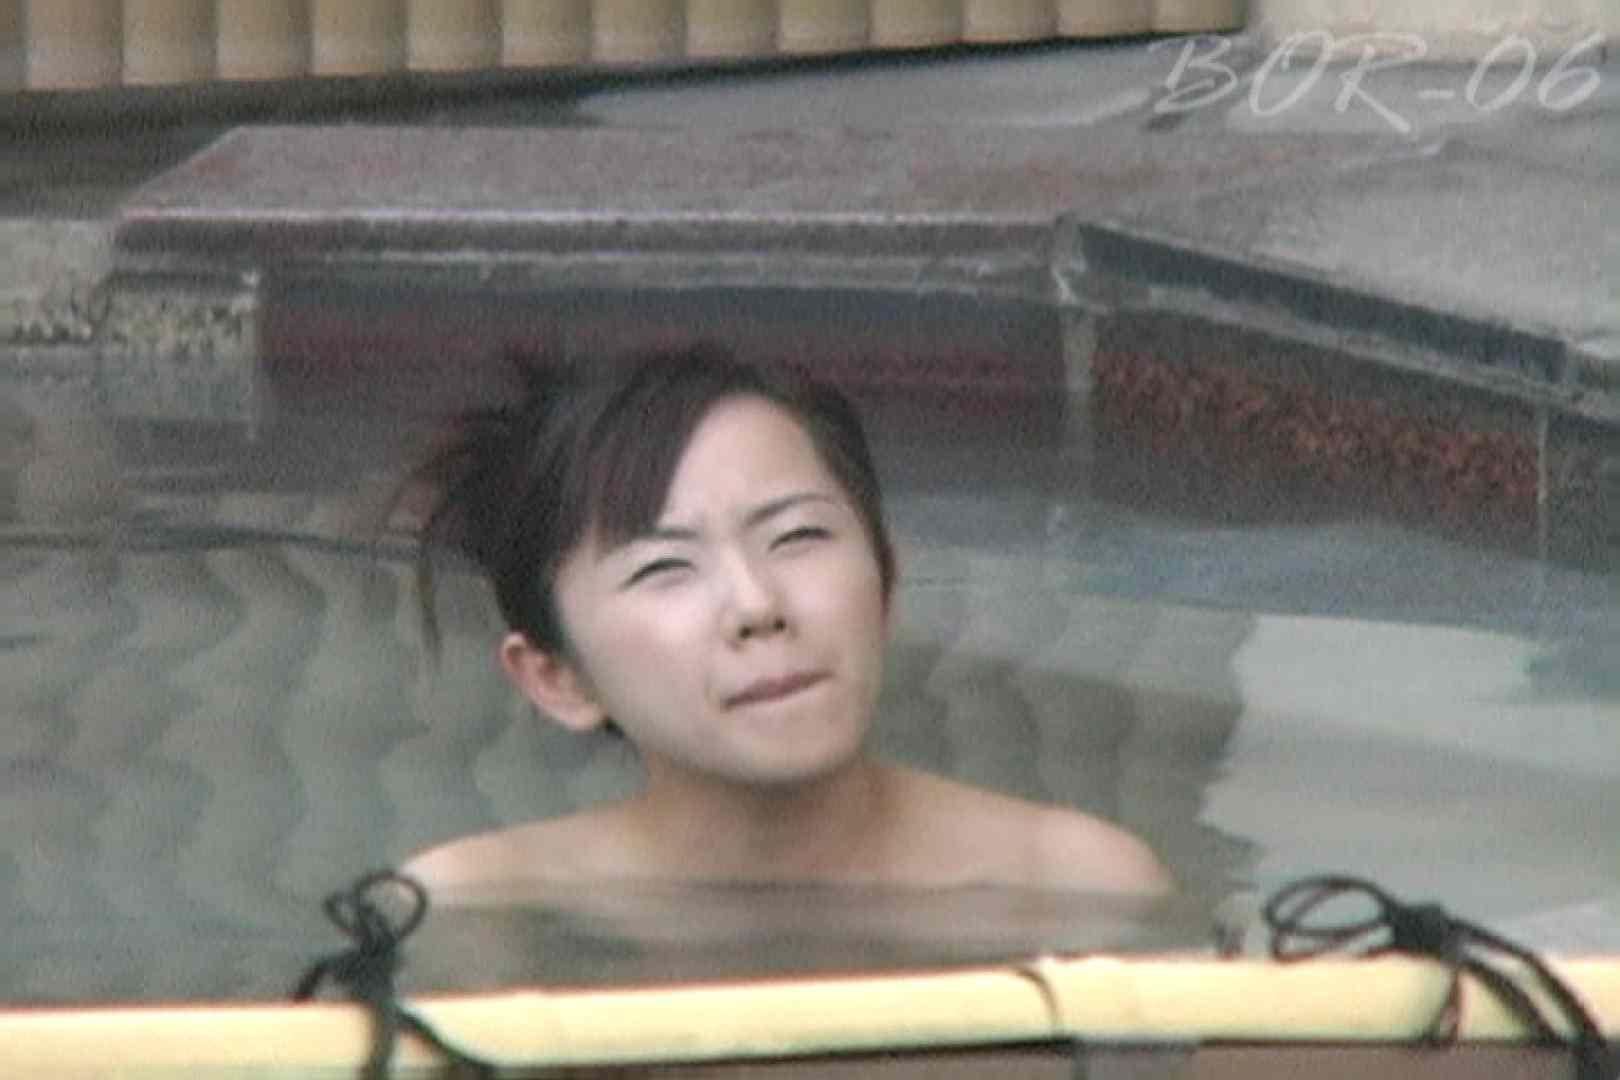 Aquaな露天風呂Vol.521 OLセックス | 盗撮  92画像 49